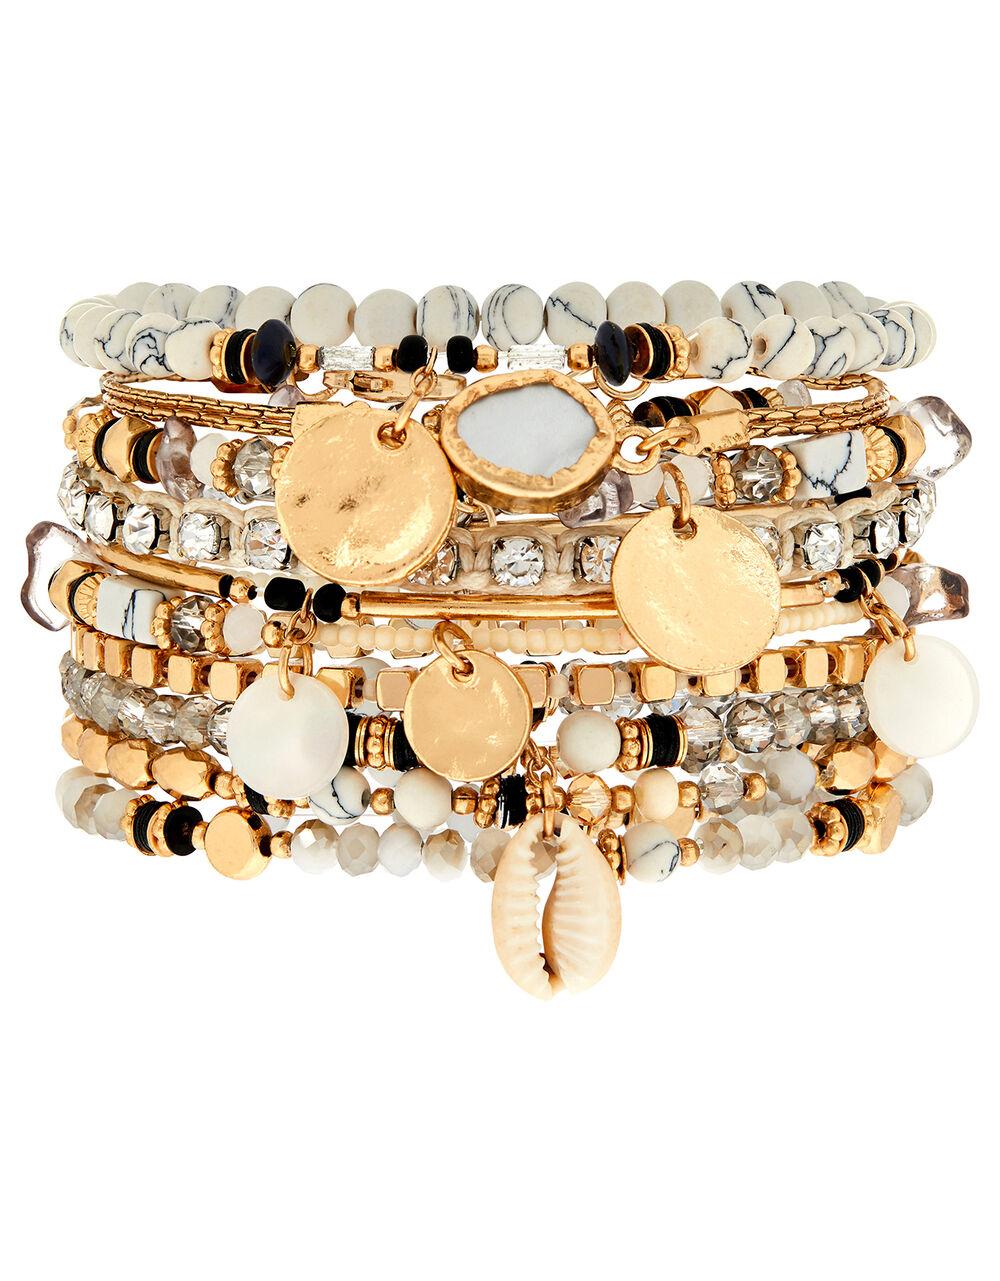 Shell and Sparkle Stretch Bracelet Set, Multi (DARKS-MULTI), large